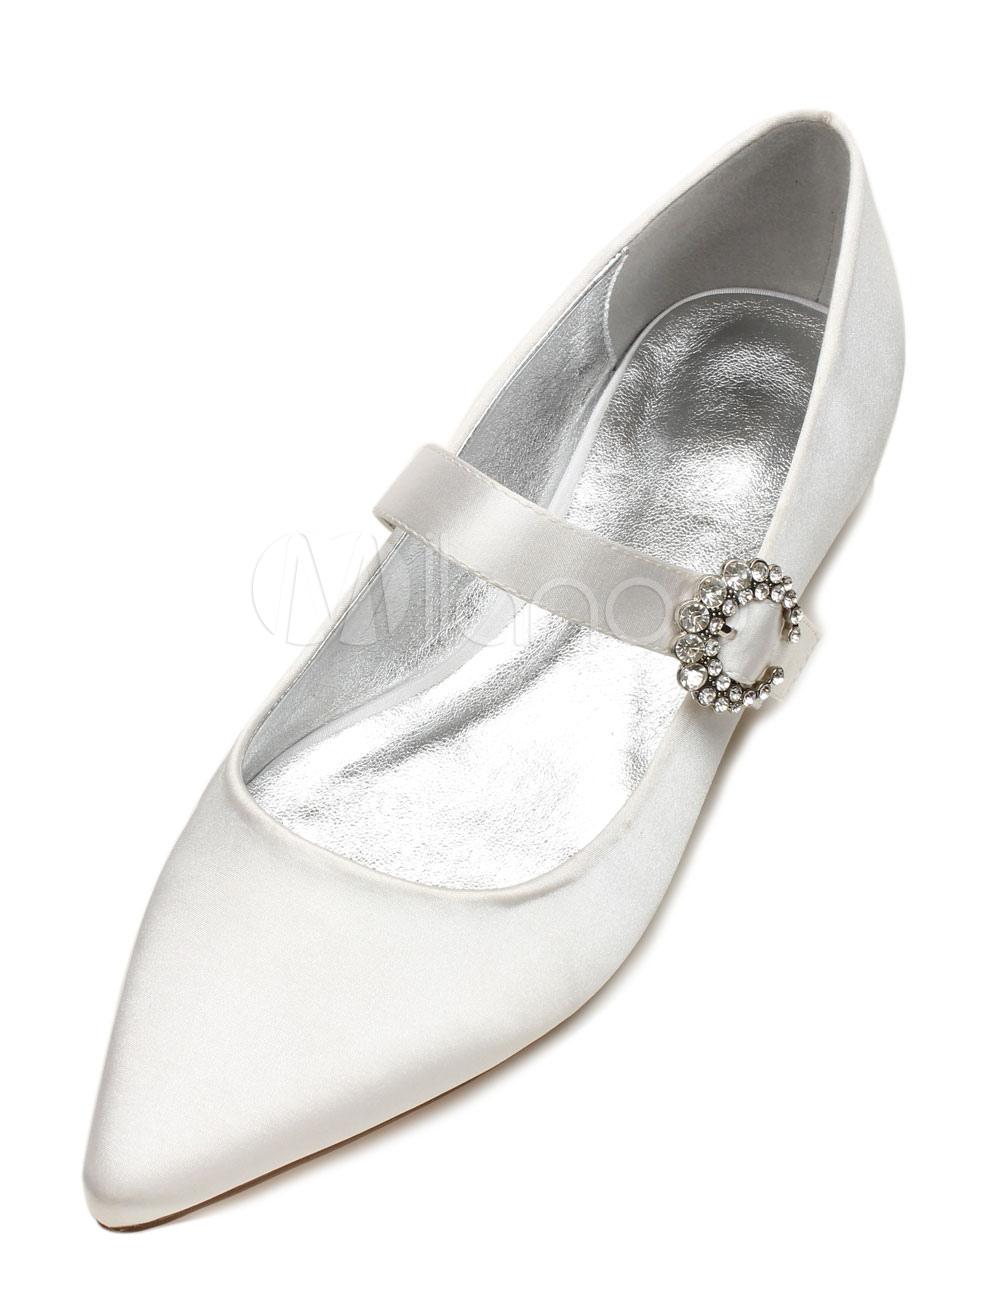 Zapatos de puntera puntiaguada Planos de satén con pedrería elegantes para boda I6PEBy